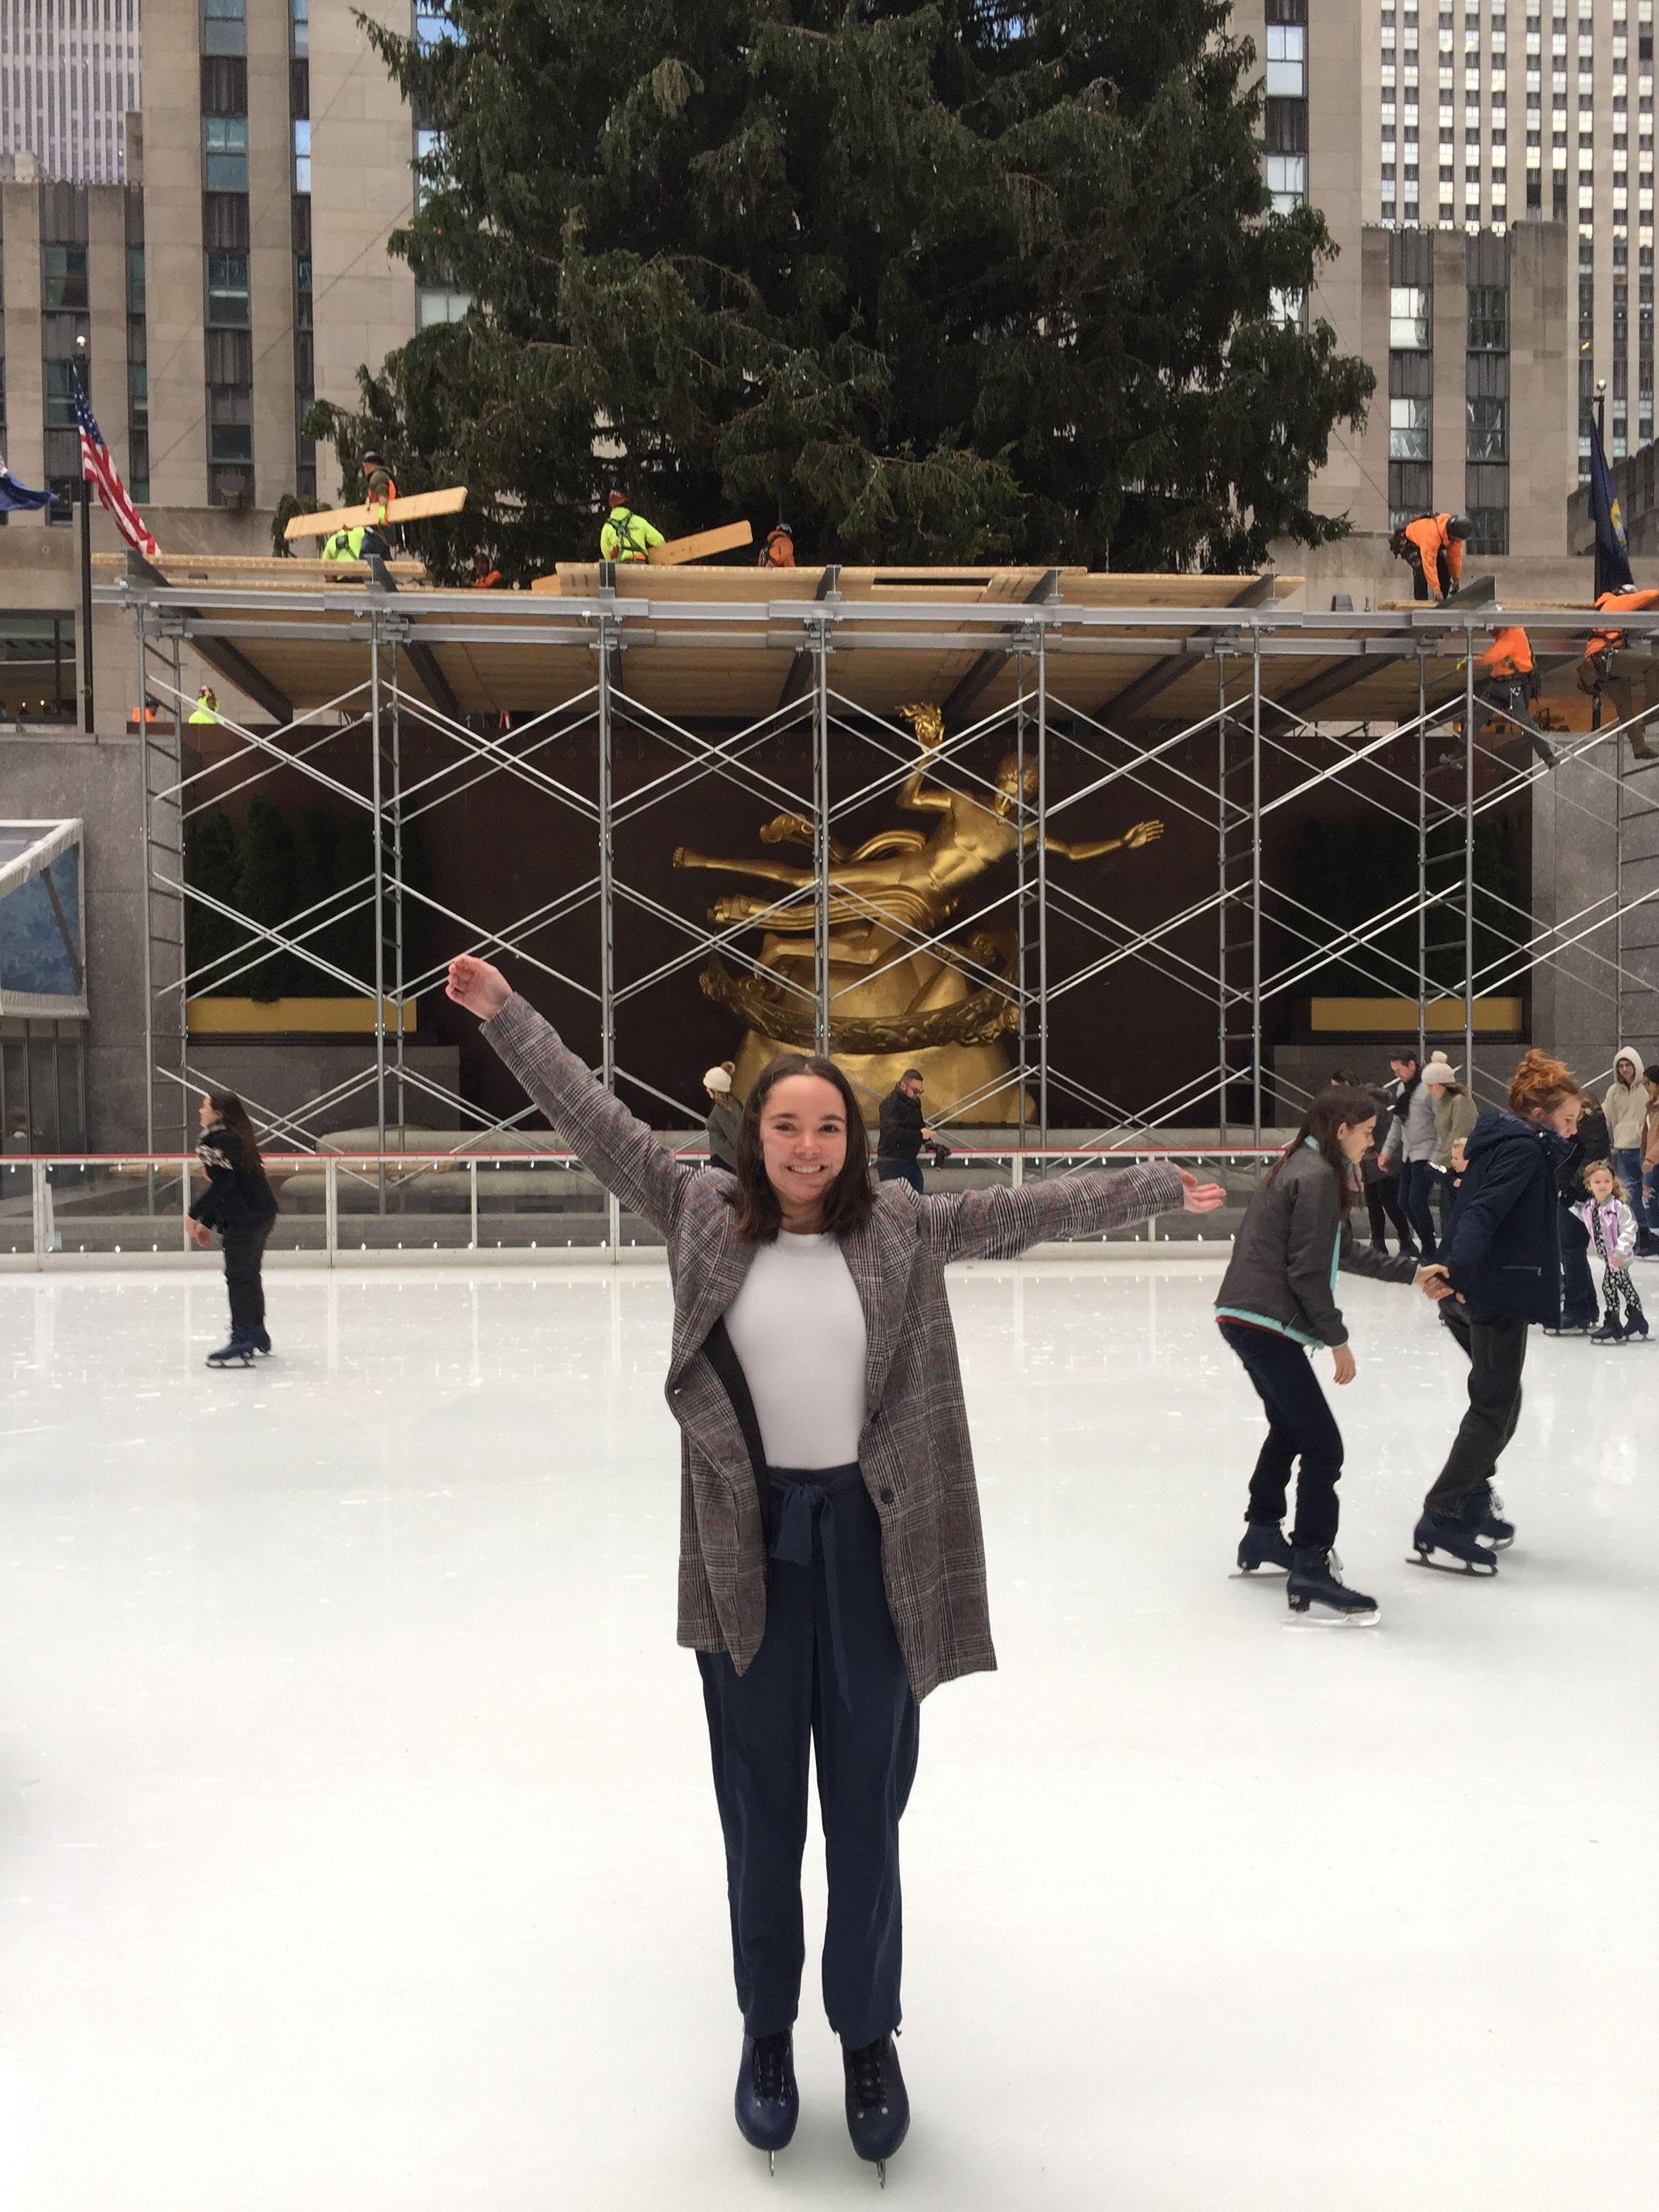 Pc: Ashley Peterson Pinterest: ash_peterson Instagram: Ashley.pphotography #nyc #newyork #newyorknewyork #newyorkcity #autumn #autumninnewyork #fallcolors #autumncolors #leafcolors #leaves #autumnleaves #autumnincentralpark #colorsincentralpark #christmasinnewyork #winter #christmas #autumn #fall #skyscrapers #photography #ice #iceskate #iceskating #rockefeller #bucketlist #bohme #fashion #shein #manhattan #rockefellerskating